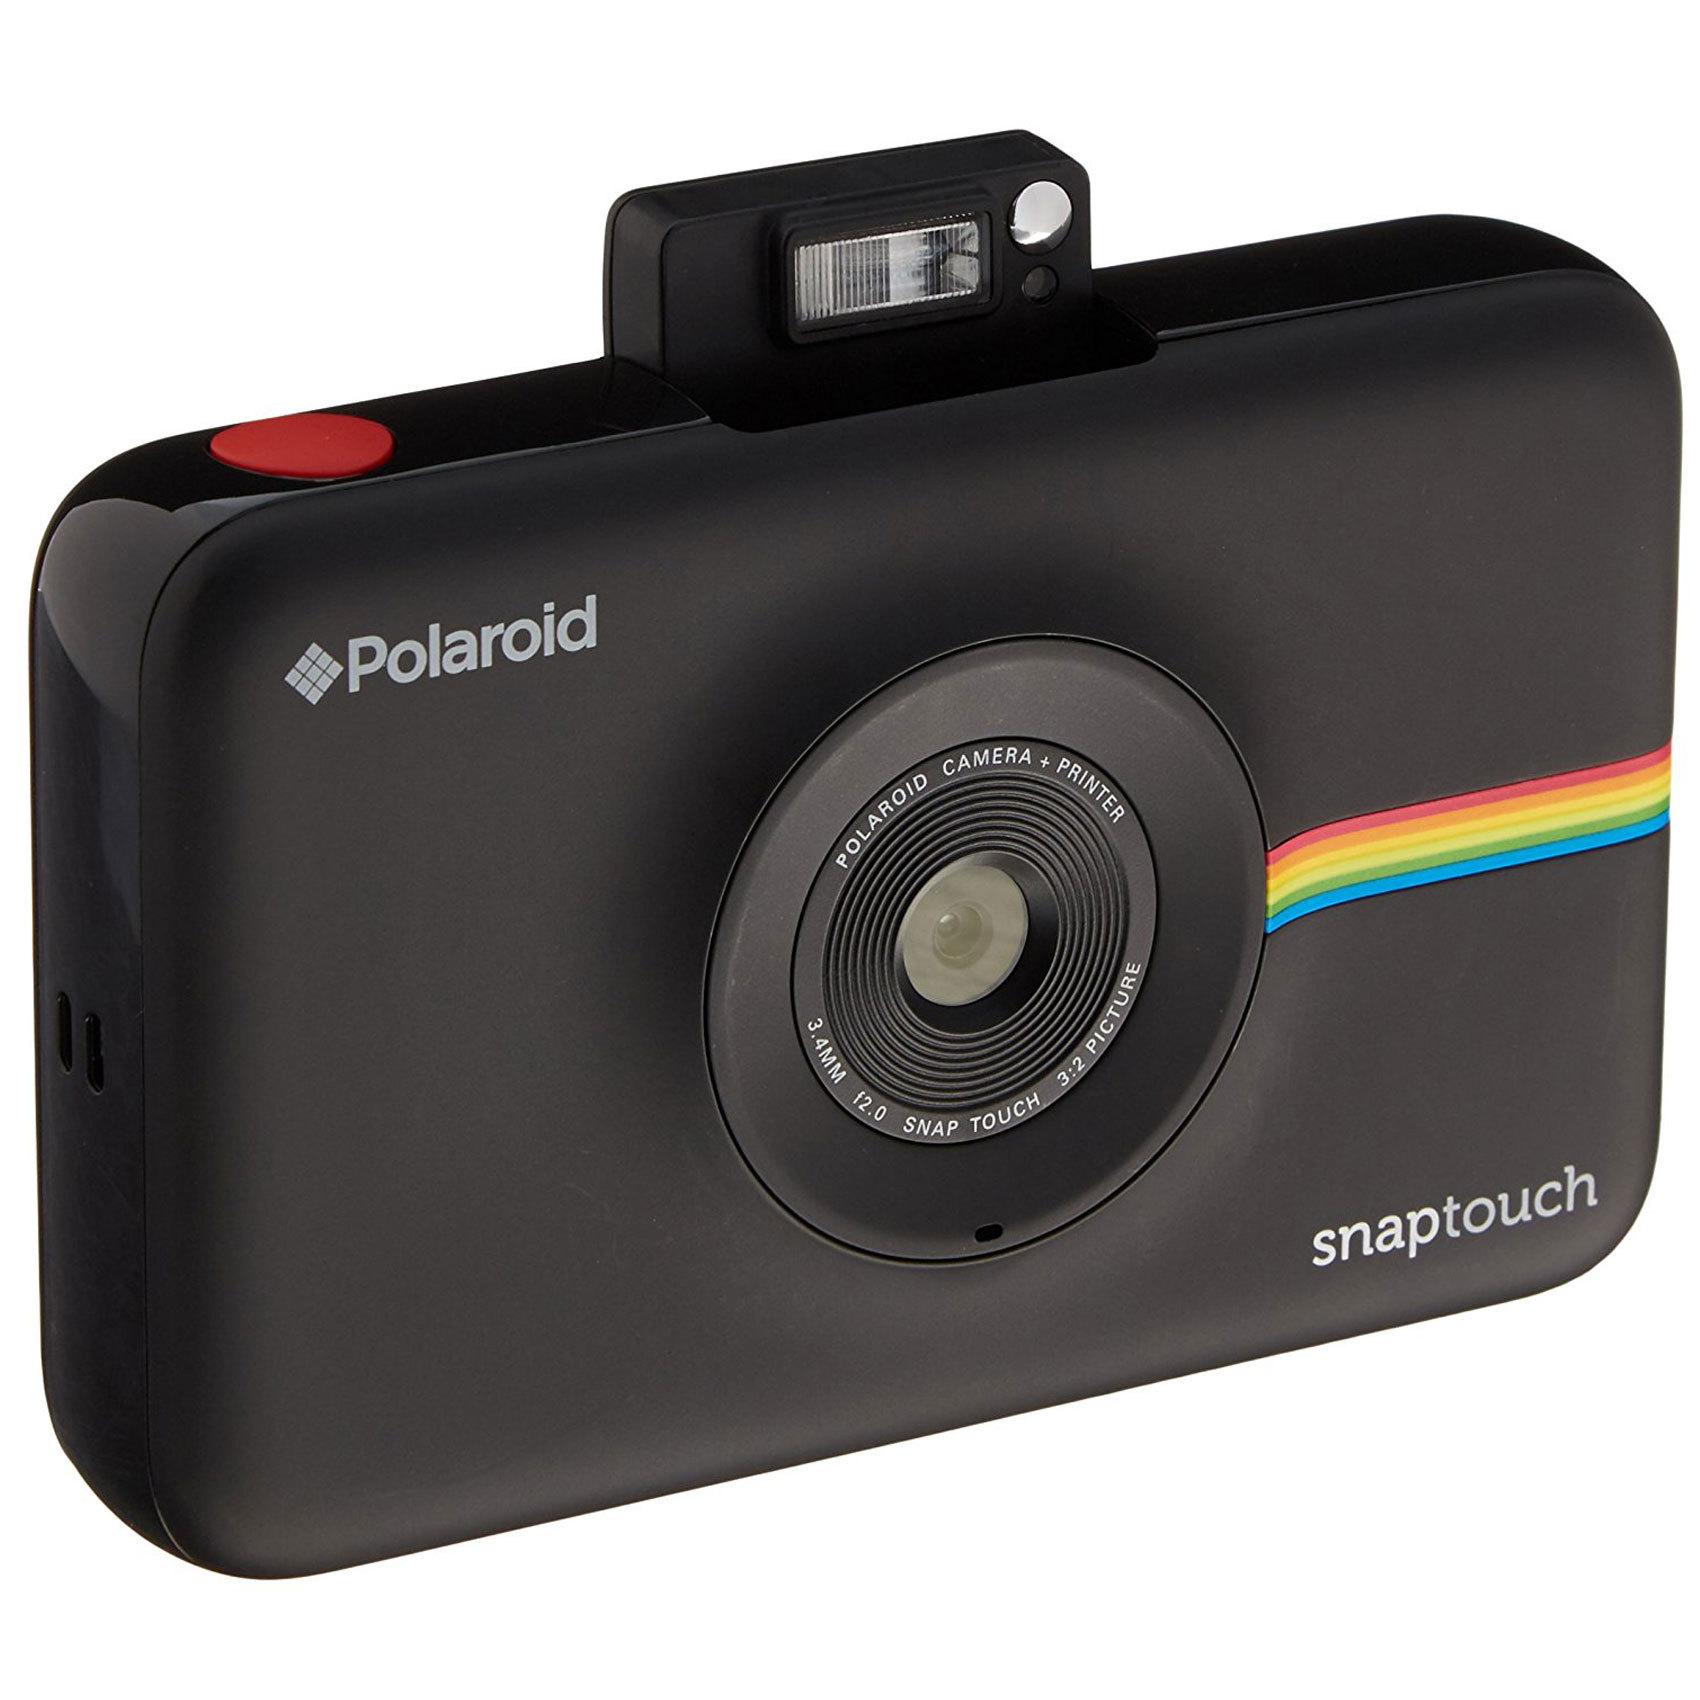 buy polaroid camera snap touch black online in uae carrefour uae